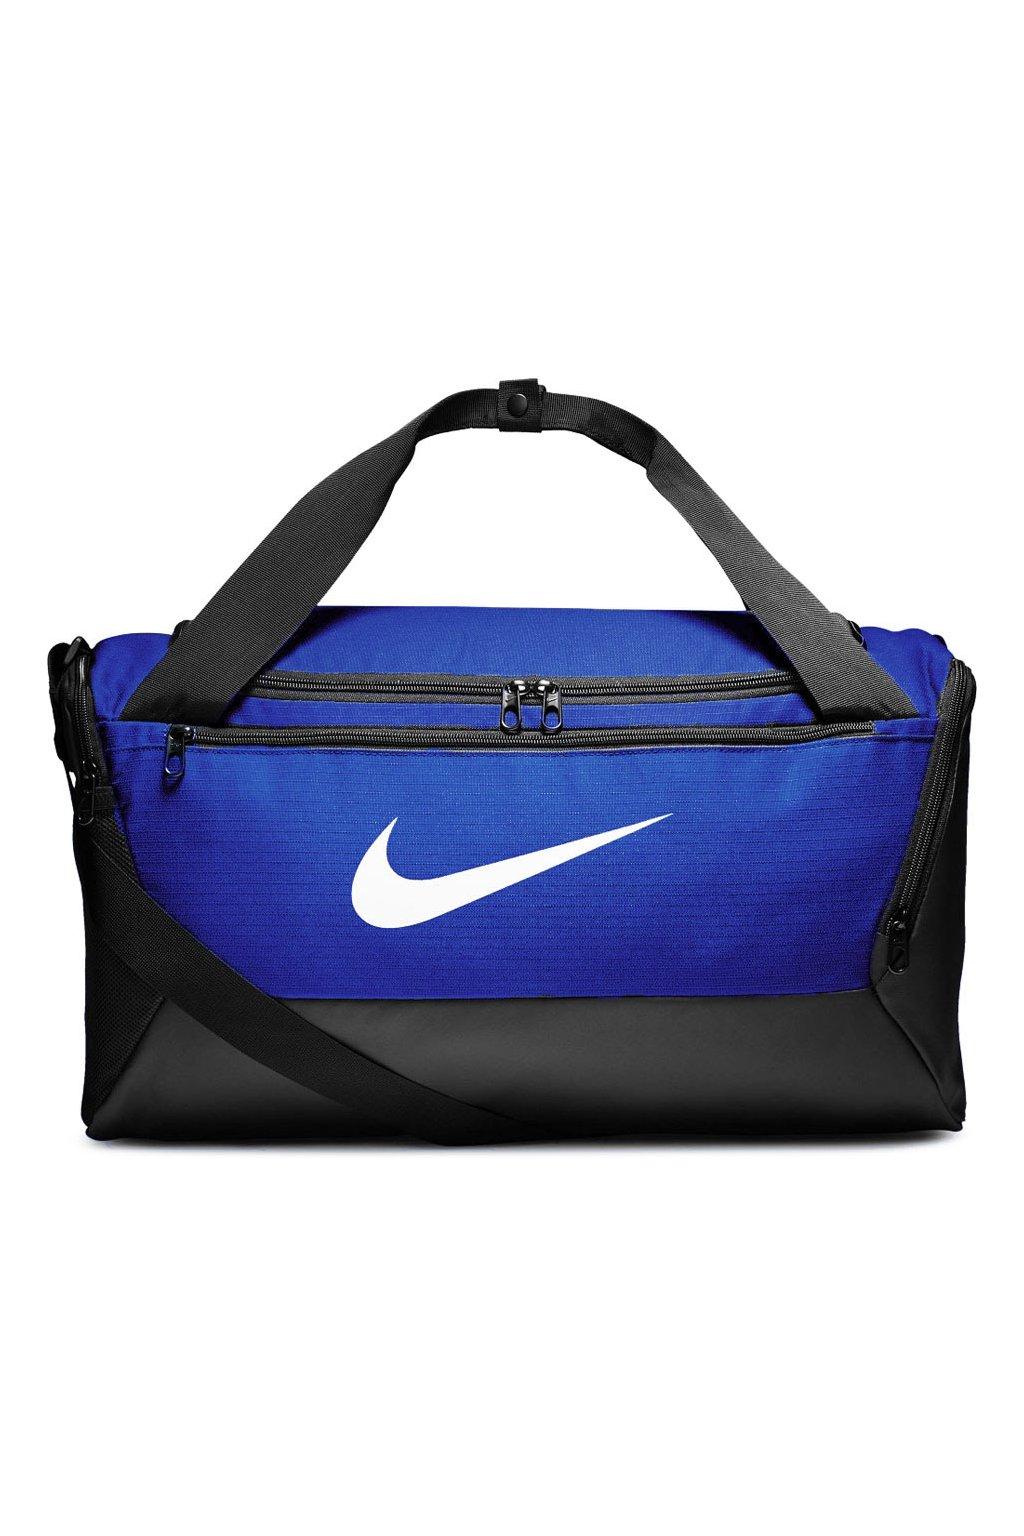 Taška Nike Brasilia S Duffel 9.0 modrá BA5957 480